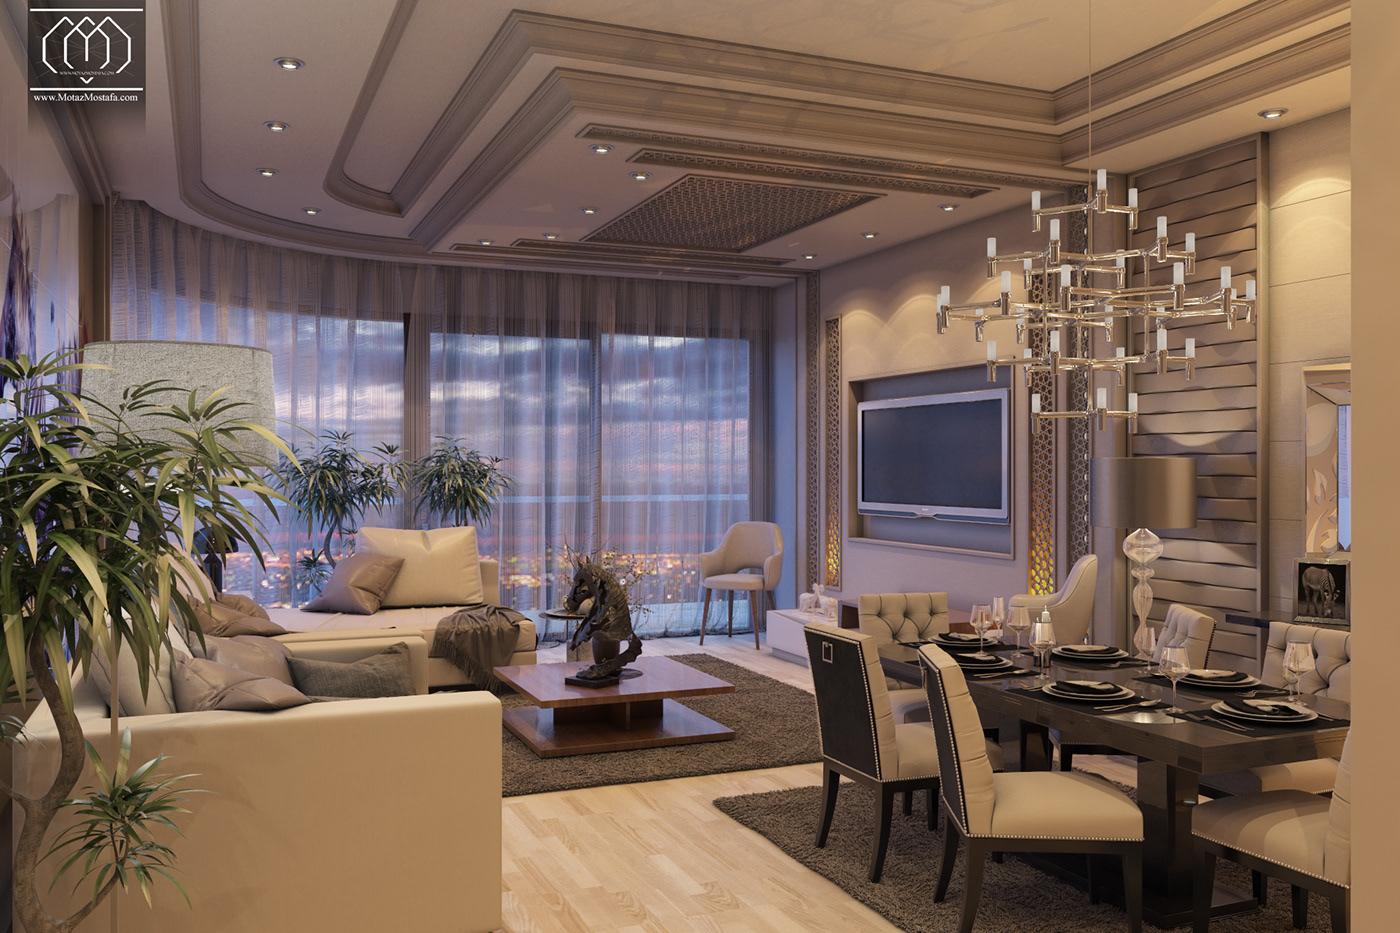 Inteiror Design inteiror design graphics visualization 3dsmax vray creative architecture Motaz mostafa